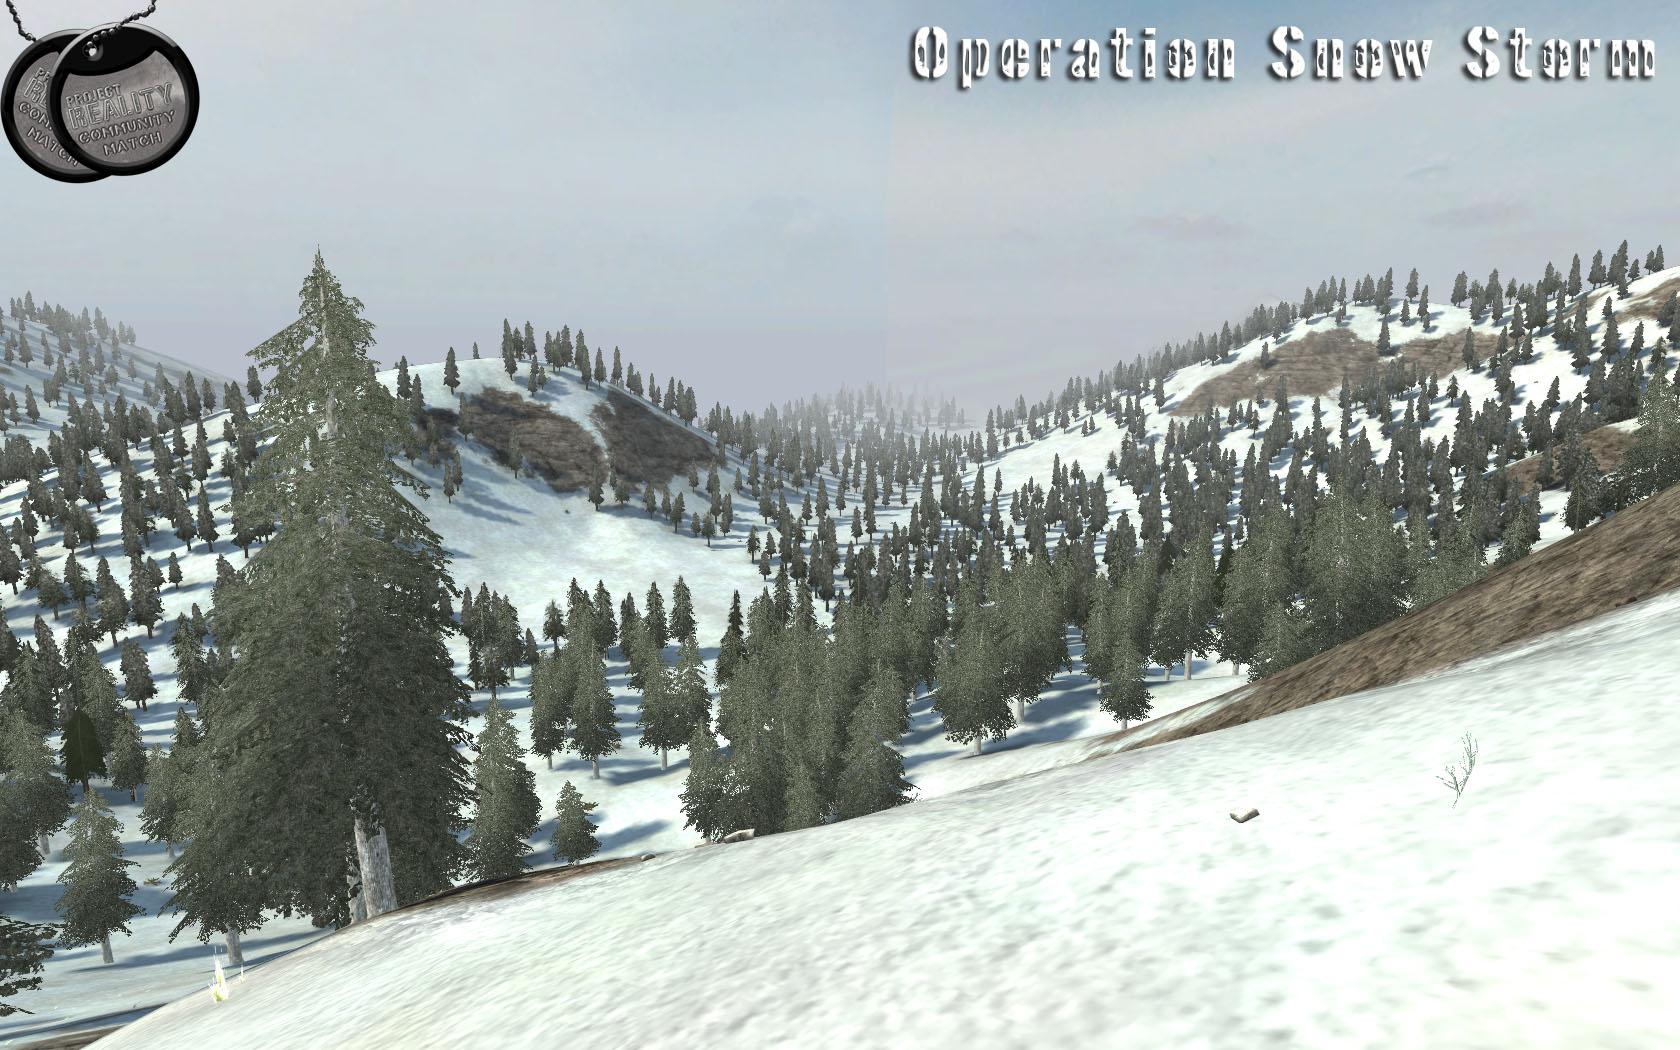 Operation Snow Storm! Oss3